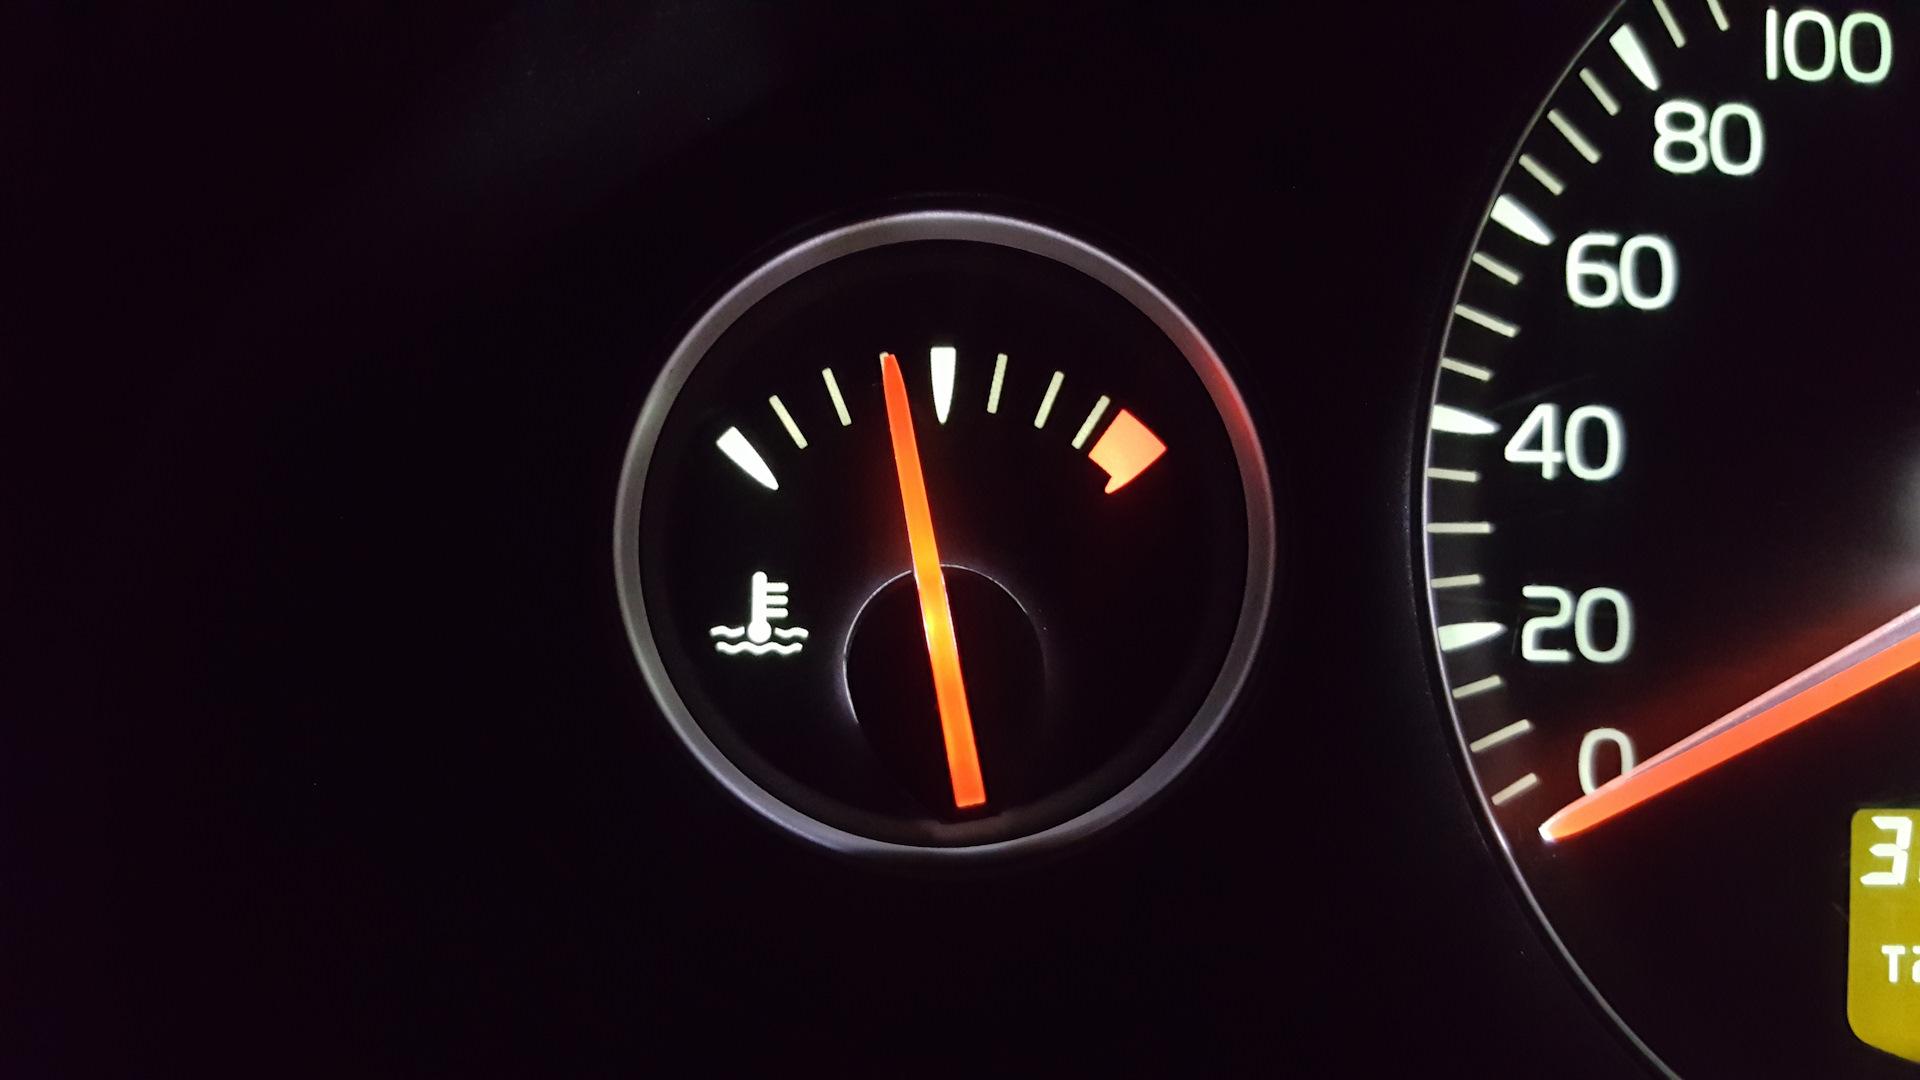 температура антифриза моторов вольво